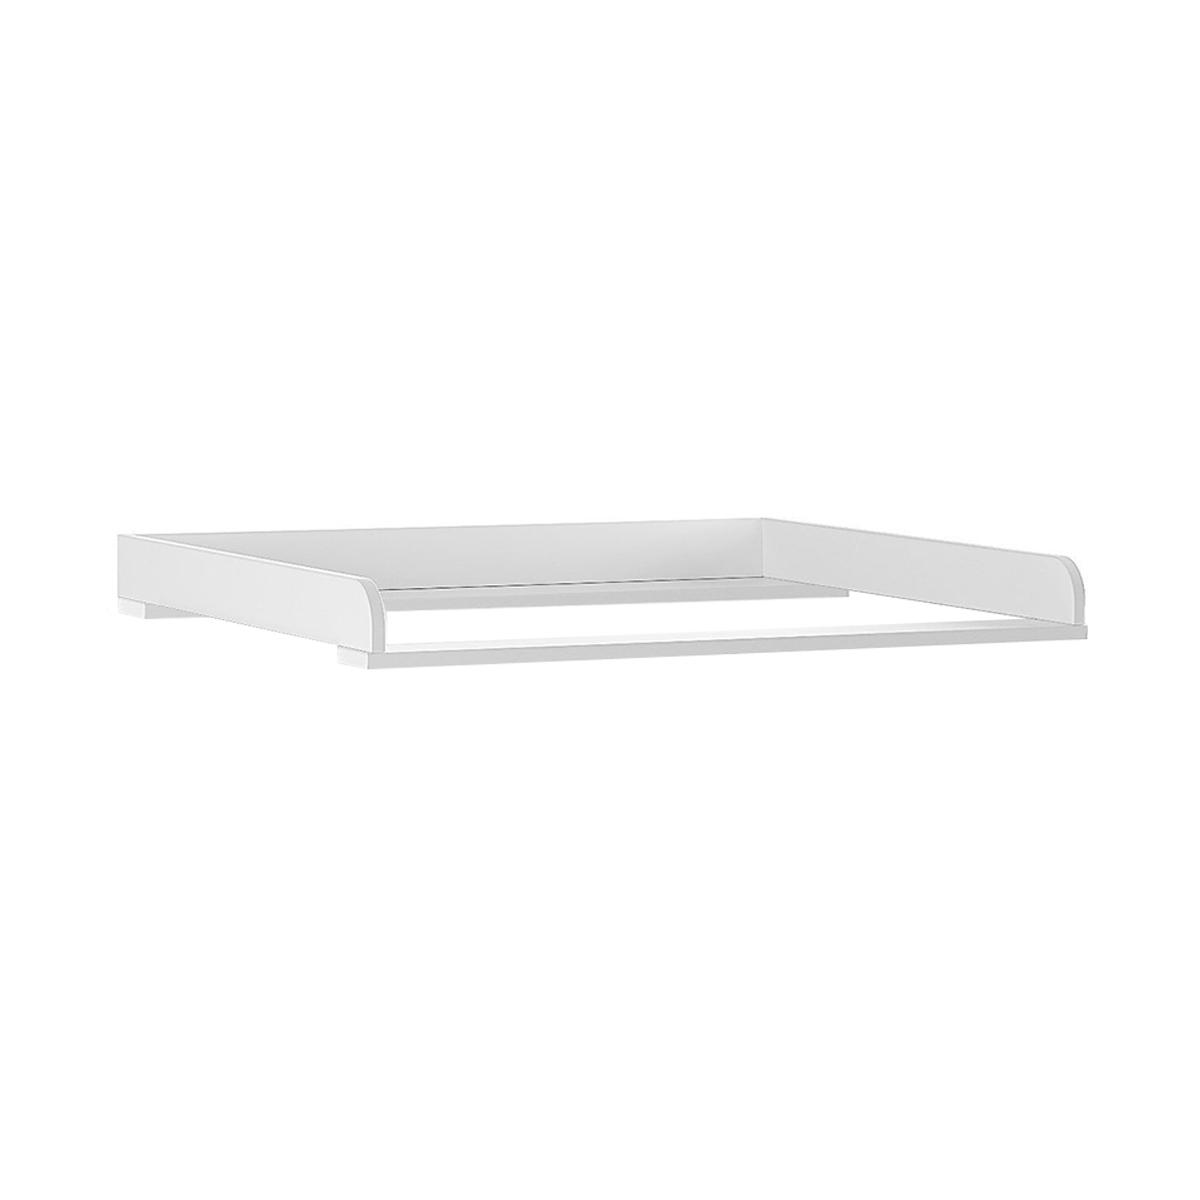 Pinio - Plan à langer pour commode à langer Marsylia MDF - Blanc